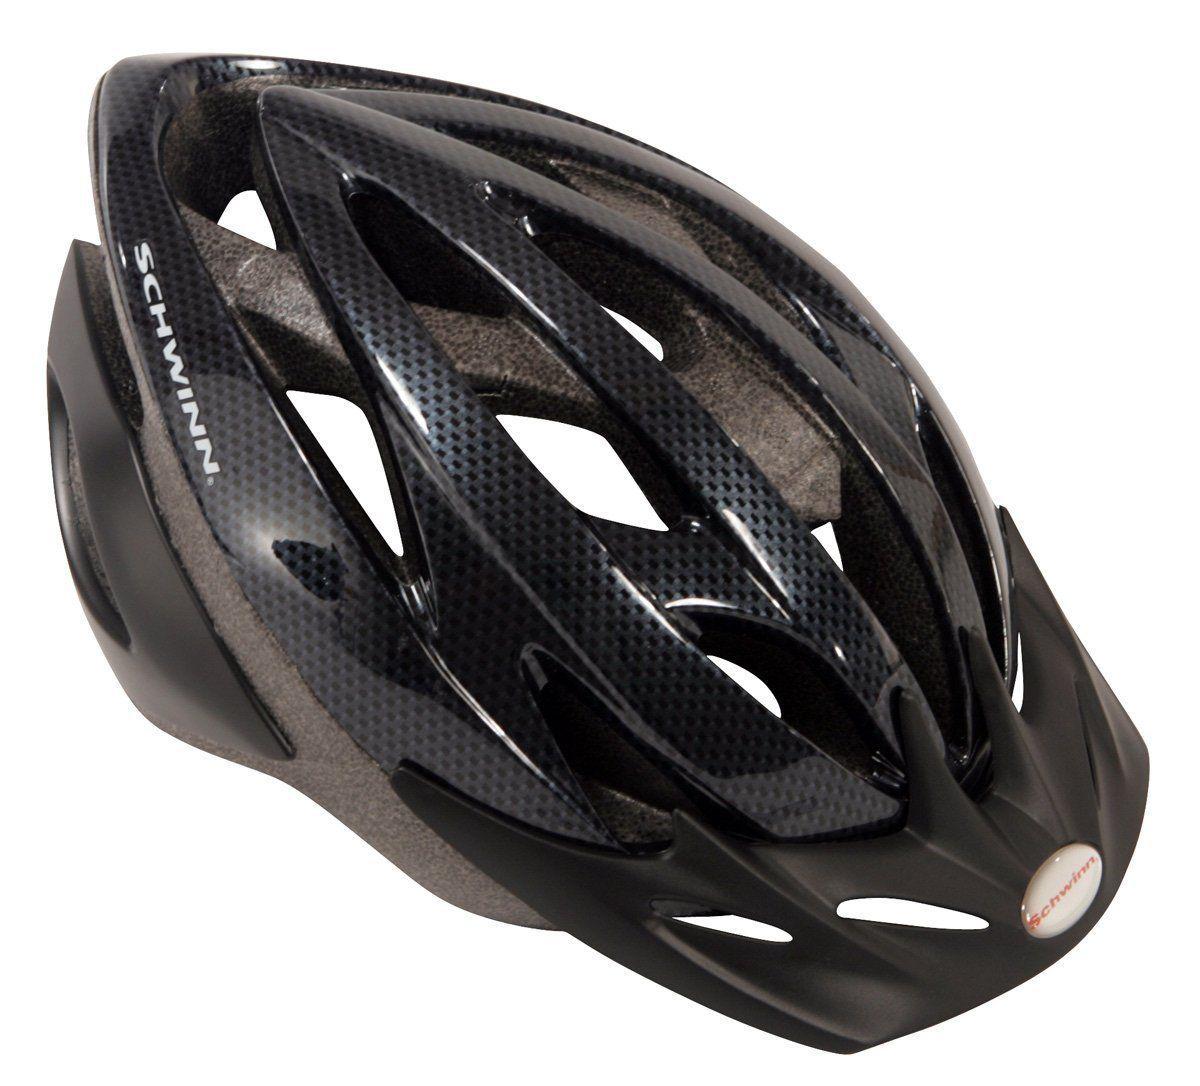 Top 10 Best Adults Bike Helmets In 2019 Reviews Cool Bike